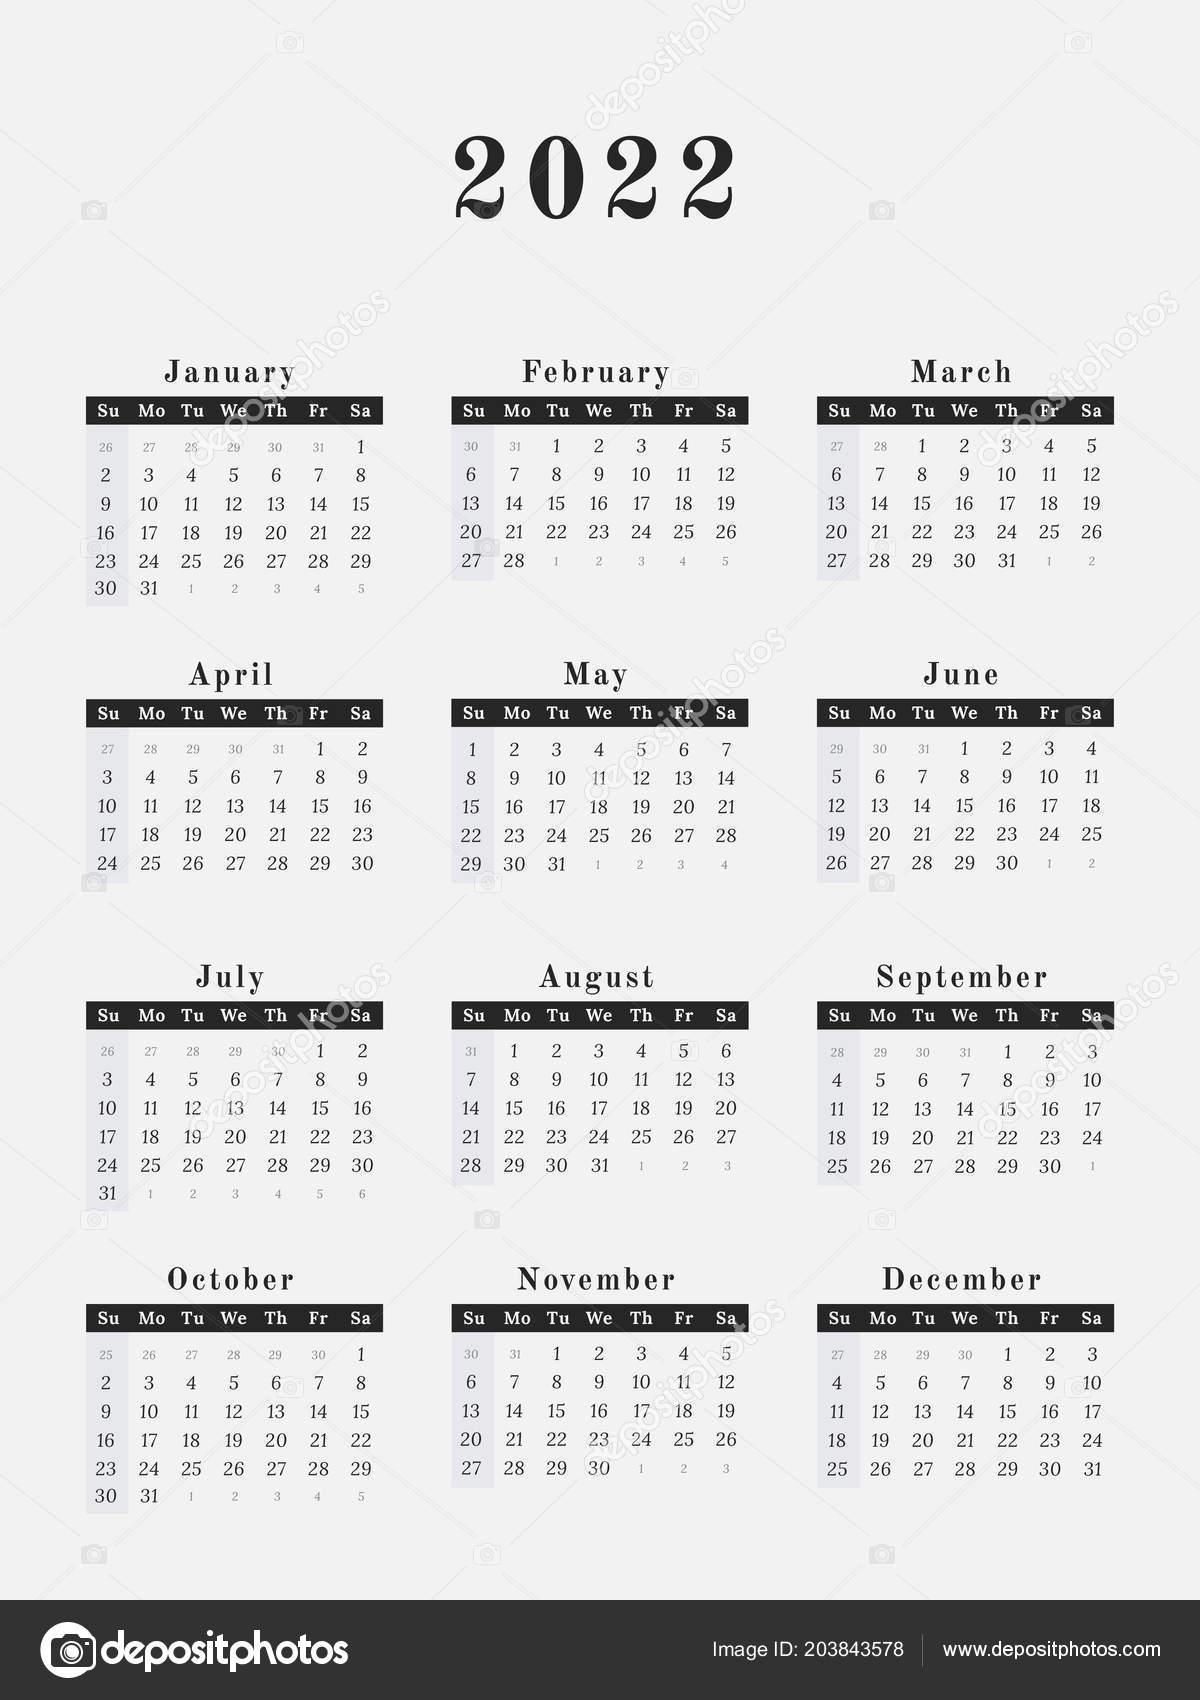 Calendar Year 2022.Calendar Year 2022 Vector Illustration Magazine Design Vector Image By C Kerdazz7 Vector Stock 203843578